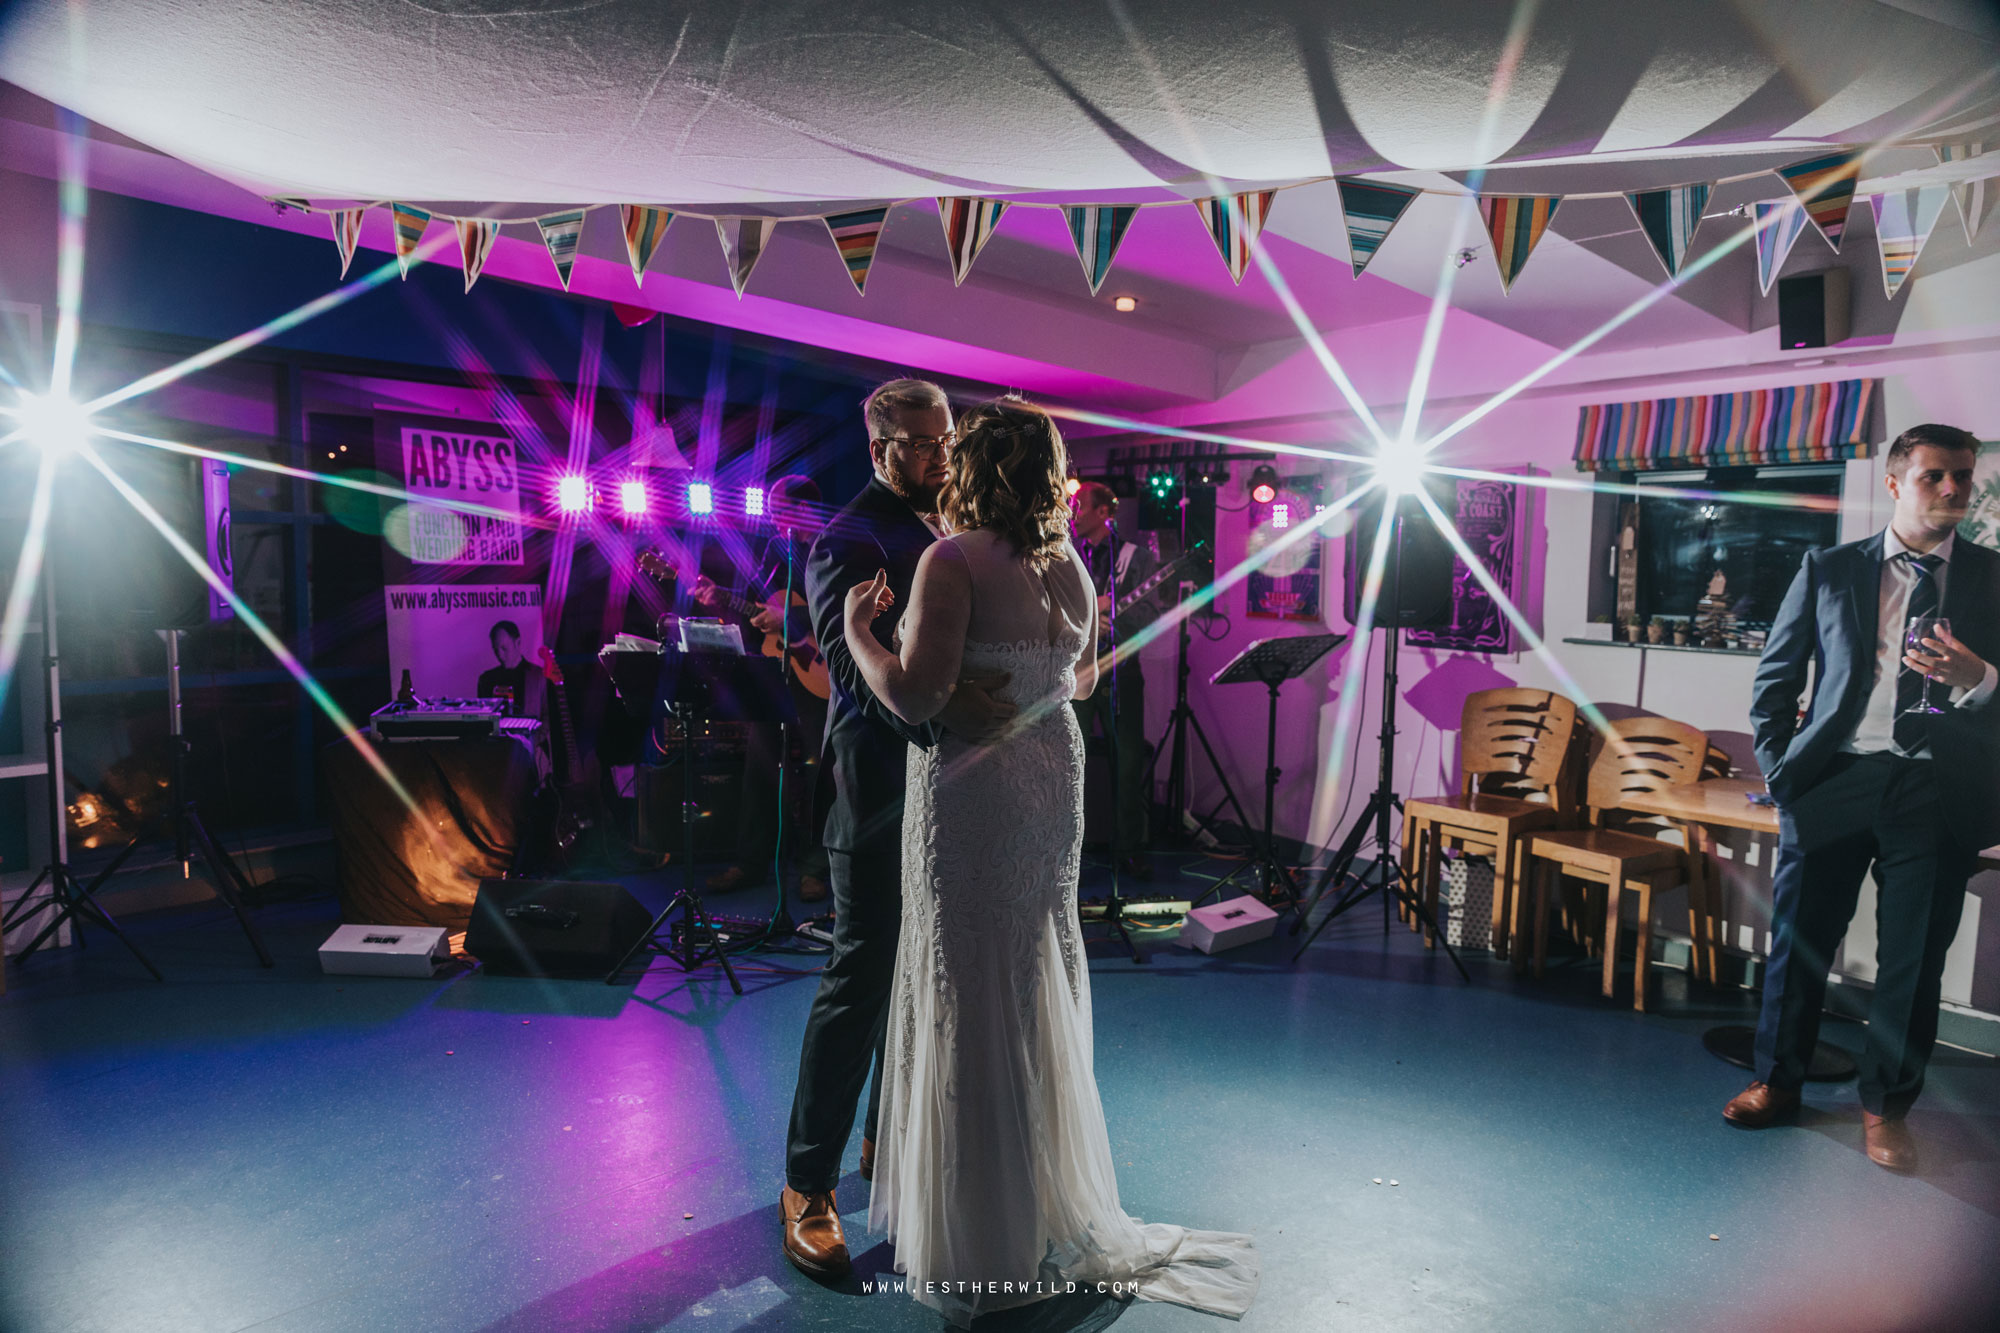 Cromer_Wedding_Beach_Outdoor_Ceremony_Norfolk_North_Lodge_Registry_Office_Rocket_House_Cafe_Cromer_Pier_IMG_5468.jpg